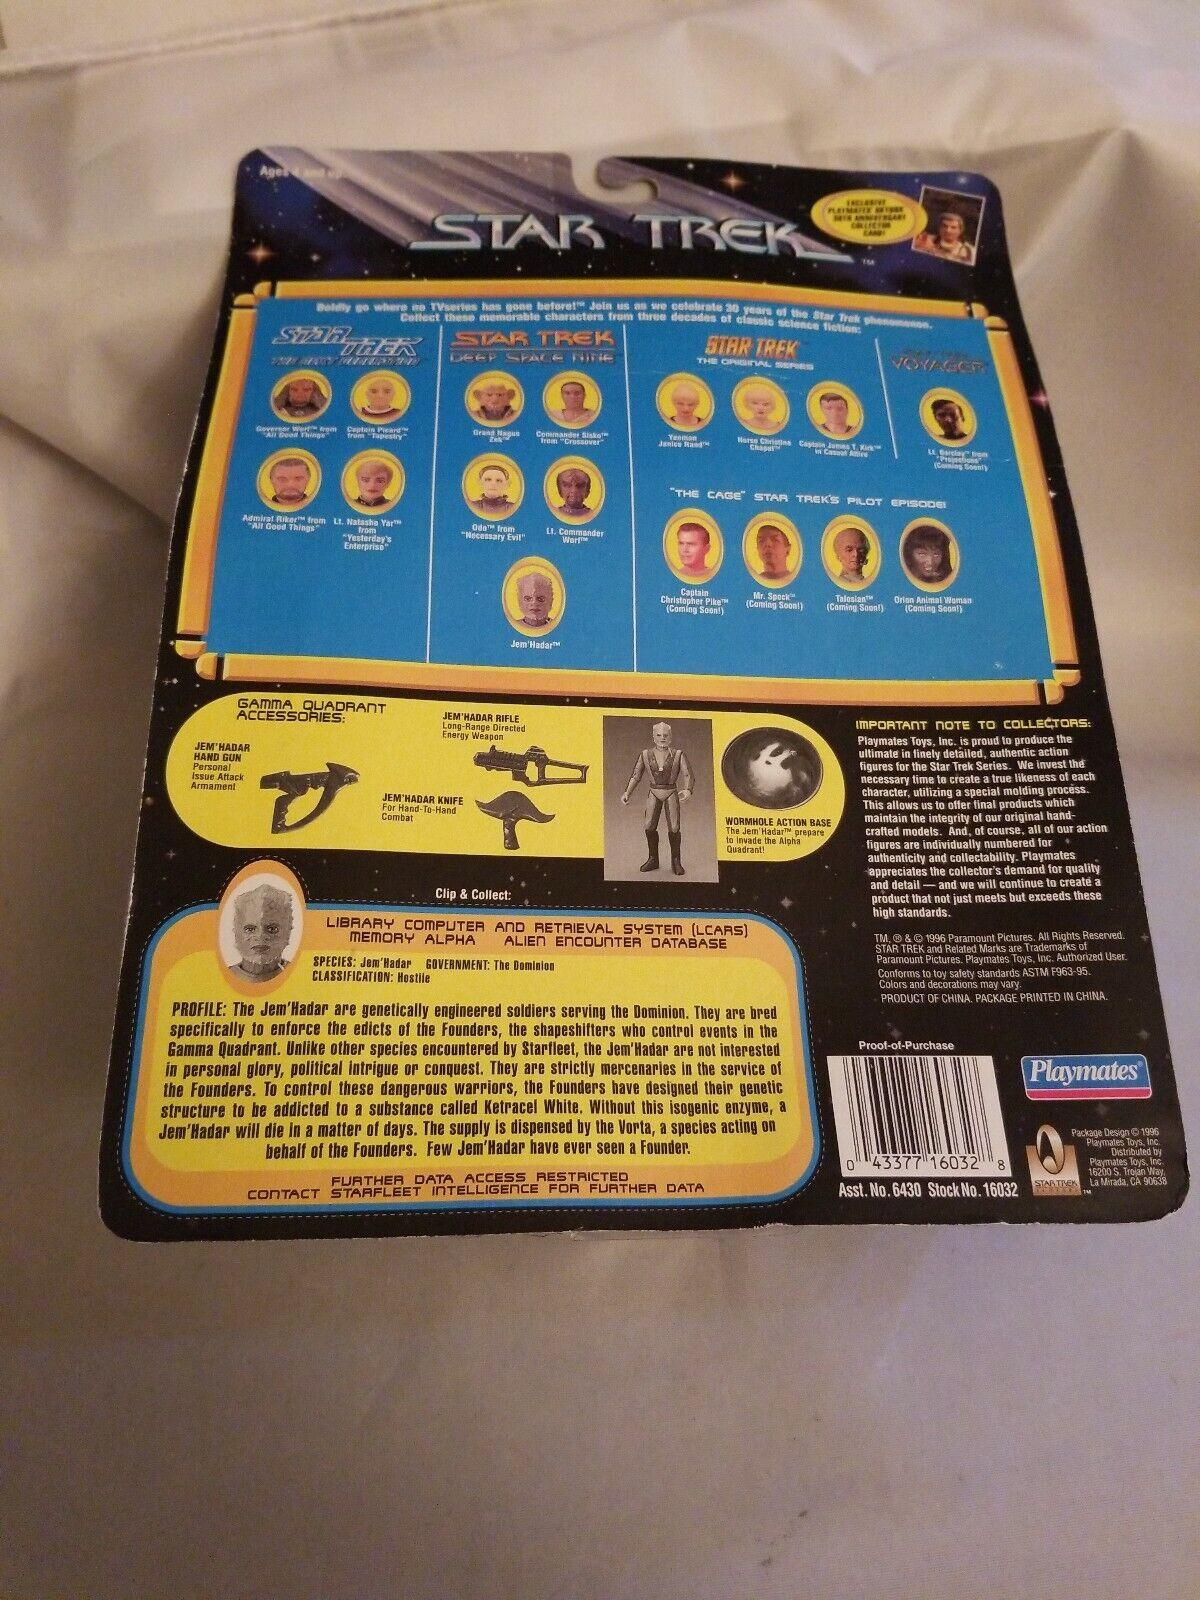 New 1996 Star Trek Jem Hadar Action Figure Card Purple Accessories Sealed